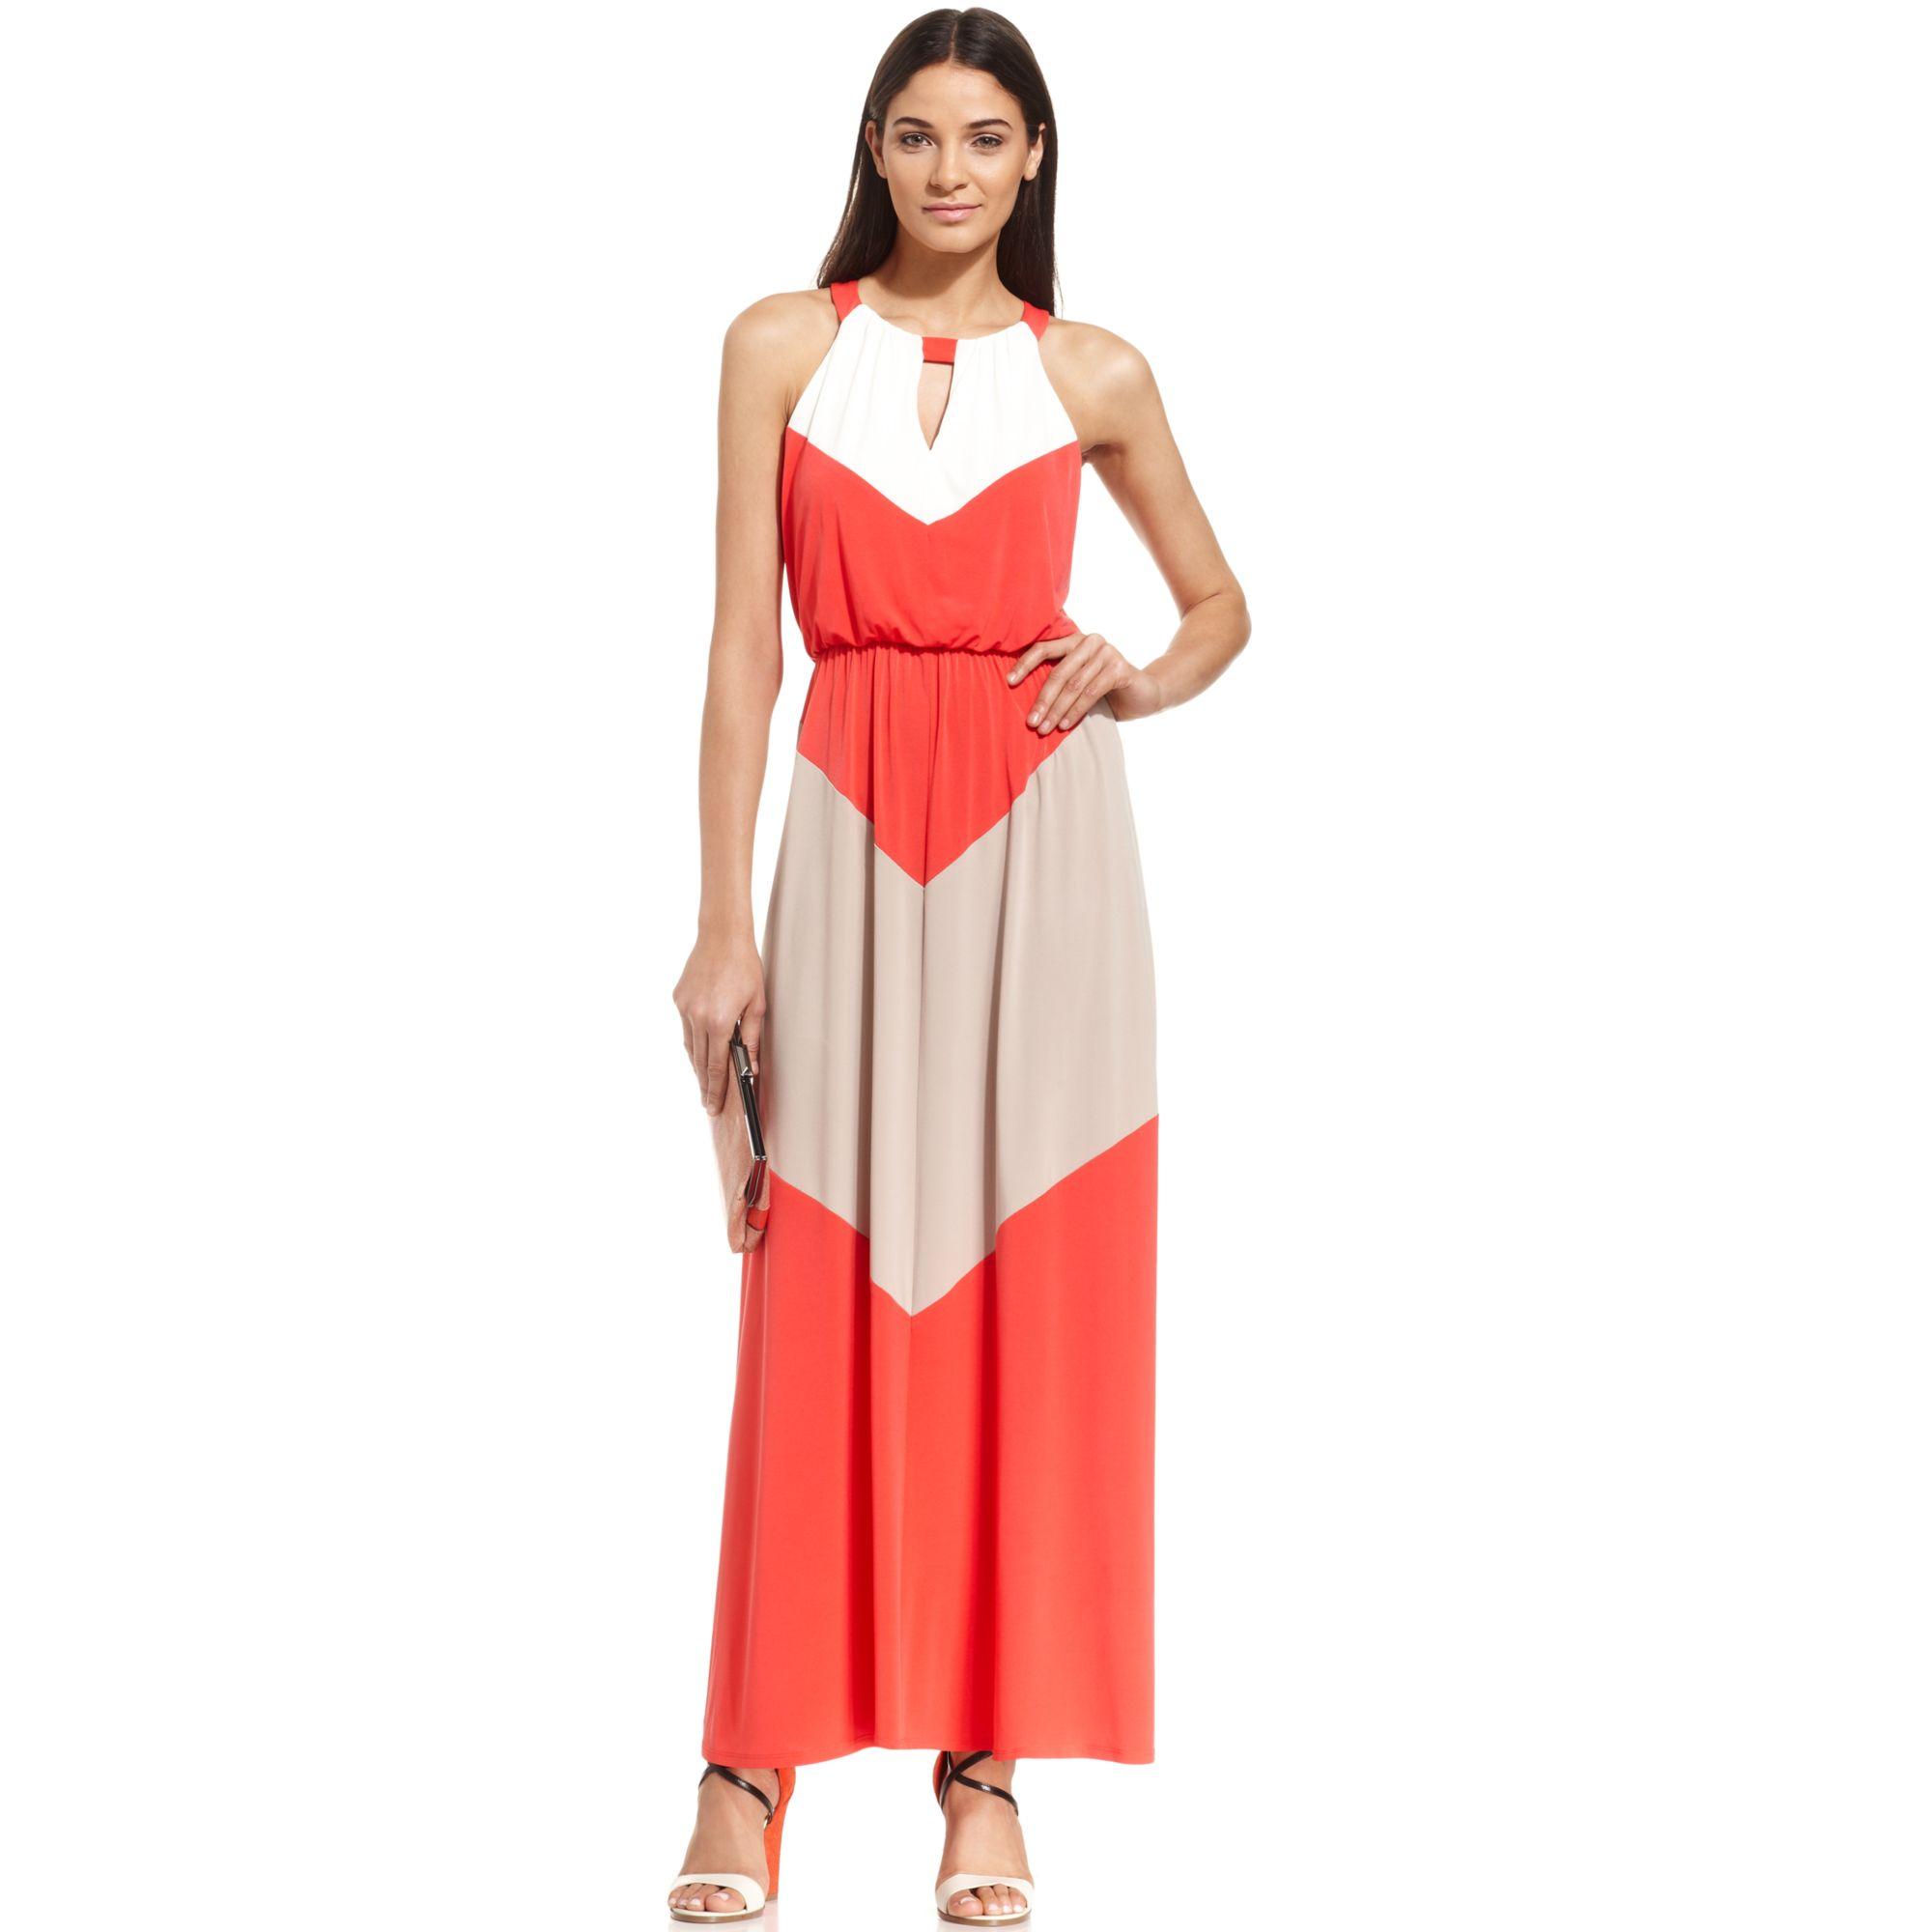 Lyst Vince Camuto Colorblock Chevron Halter Maxi Dress